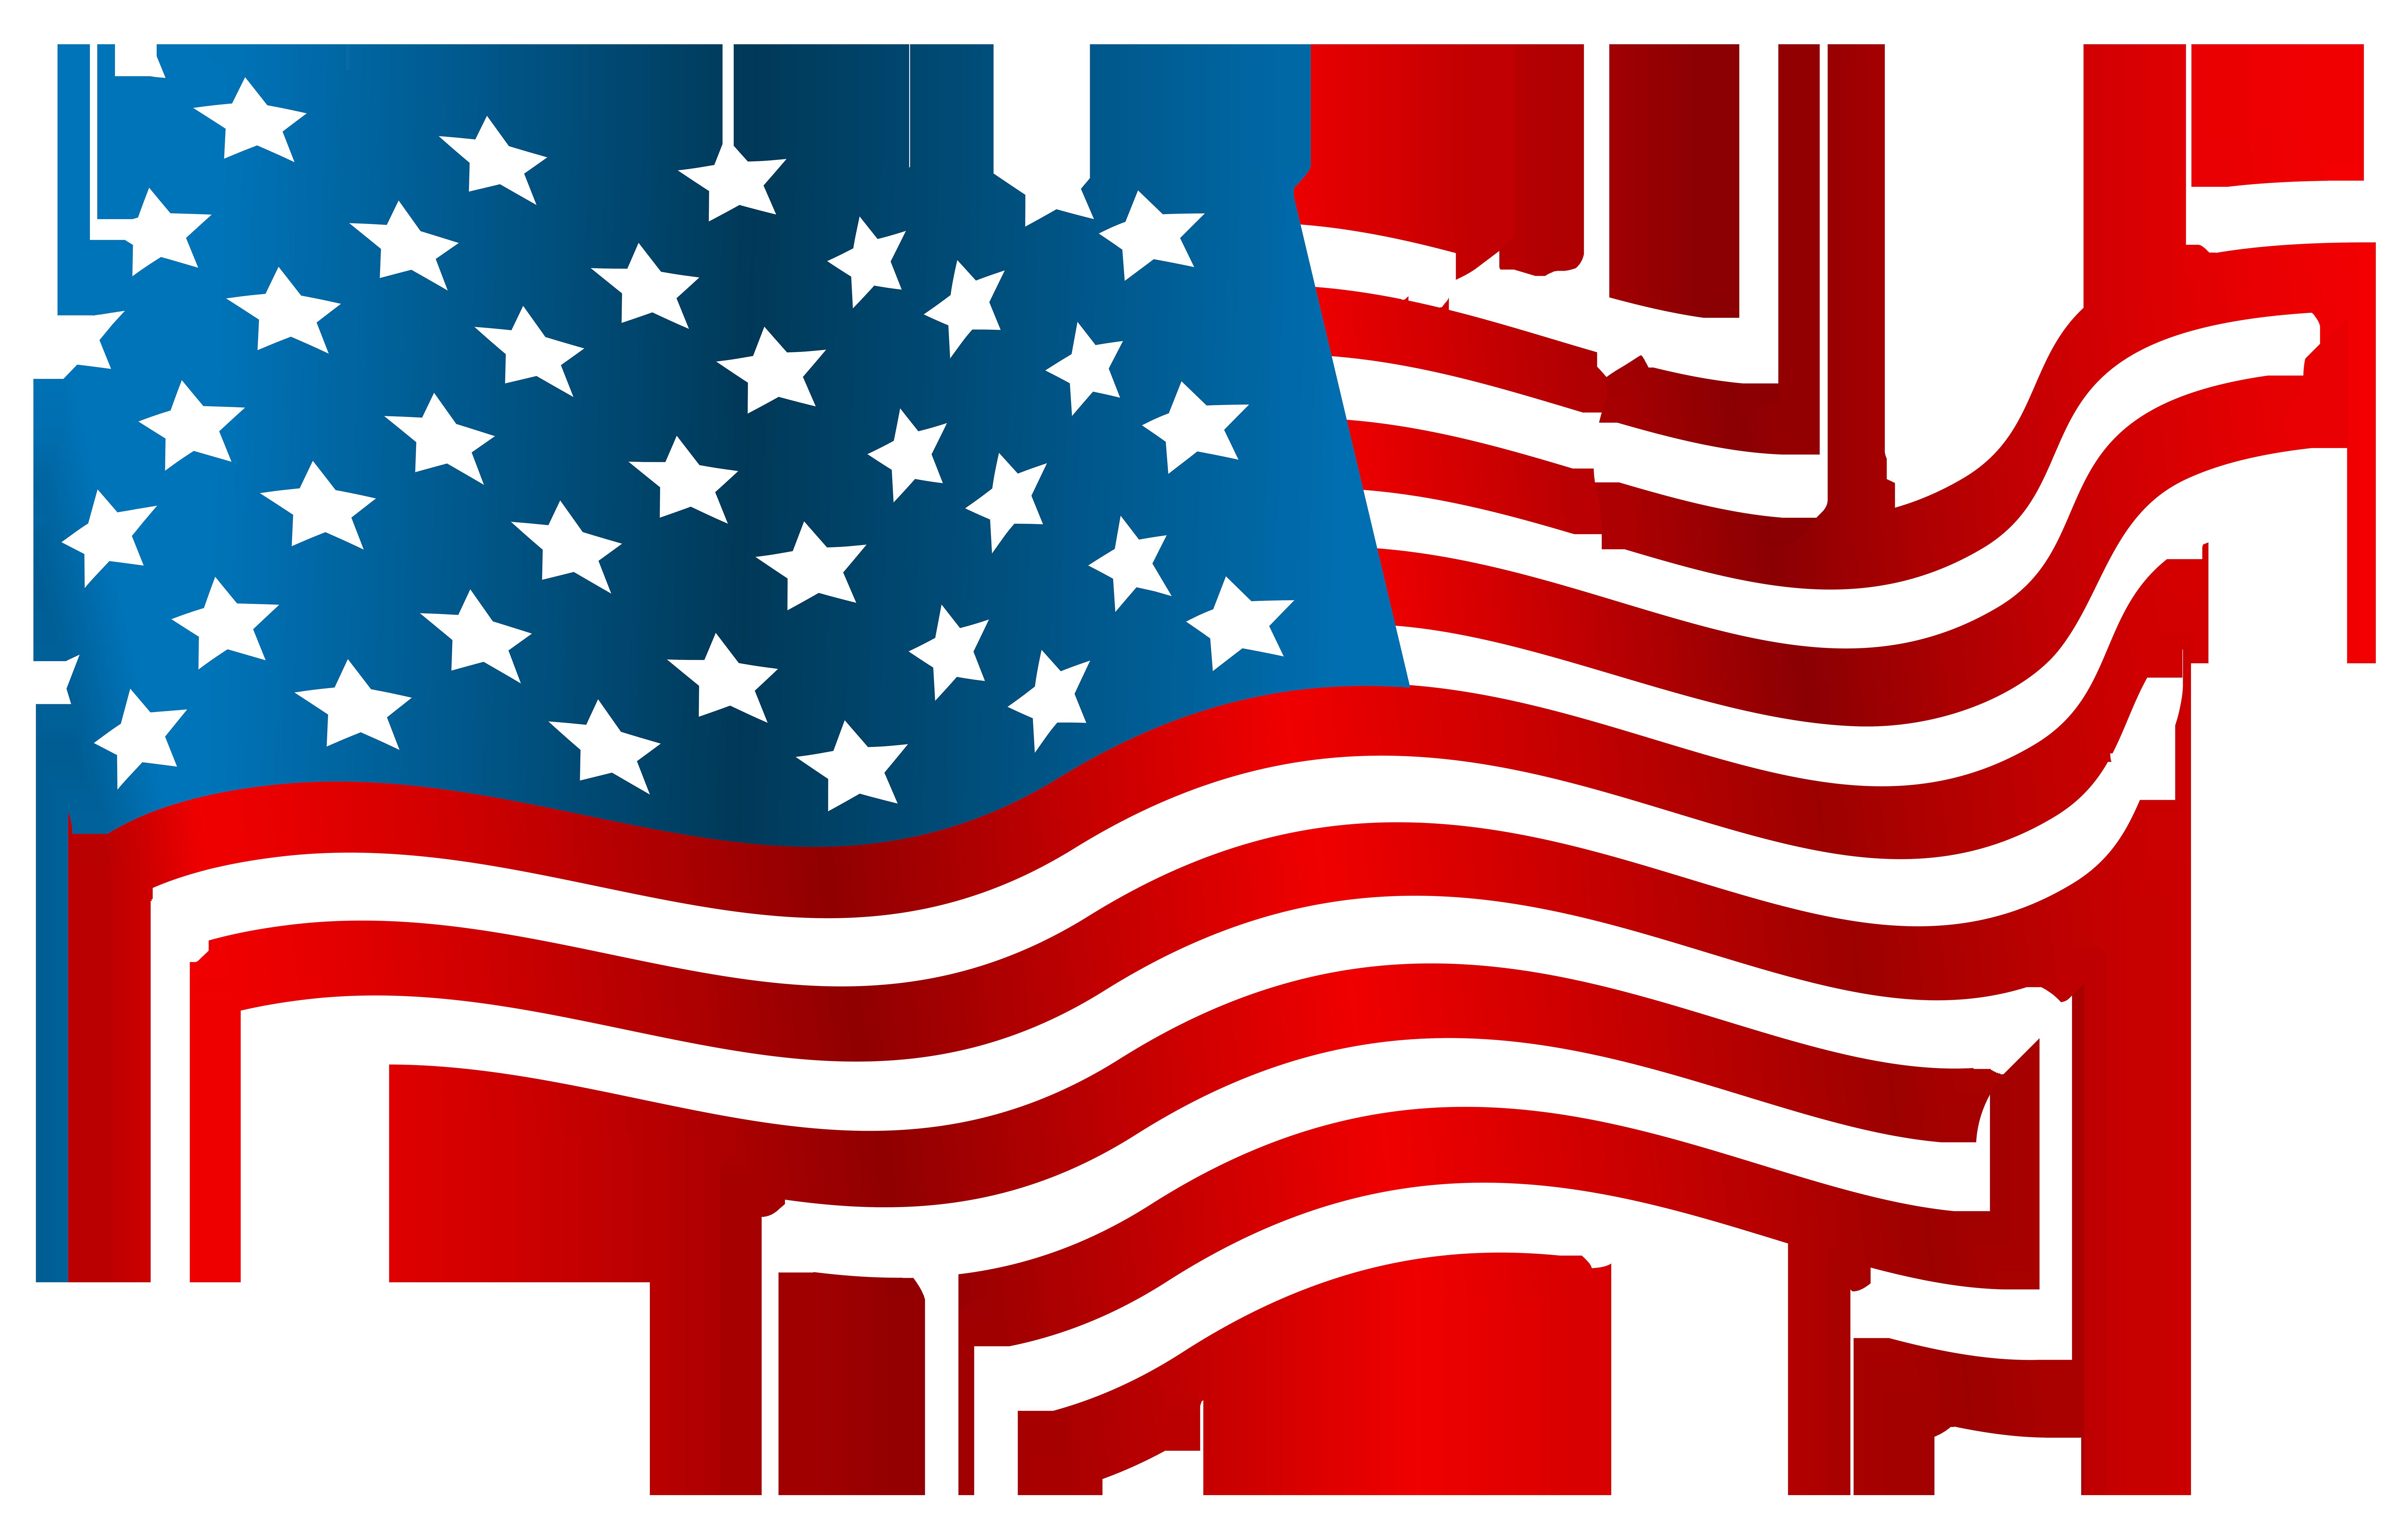 8000x5042 Usa Flag Map Png Clip Art Imageu200b Gallery Yopriceville